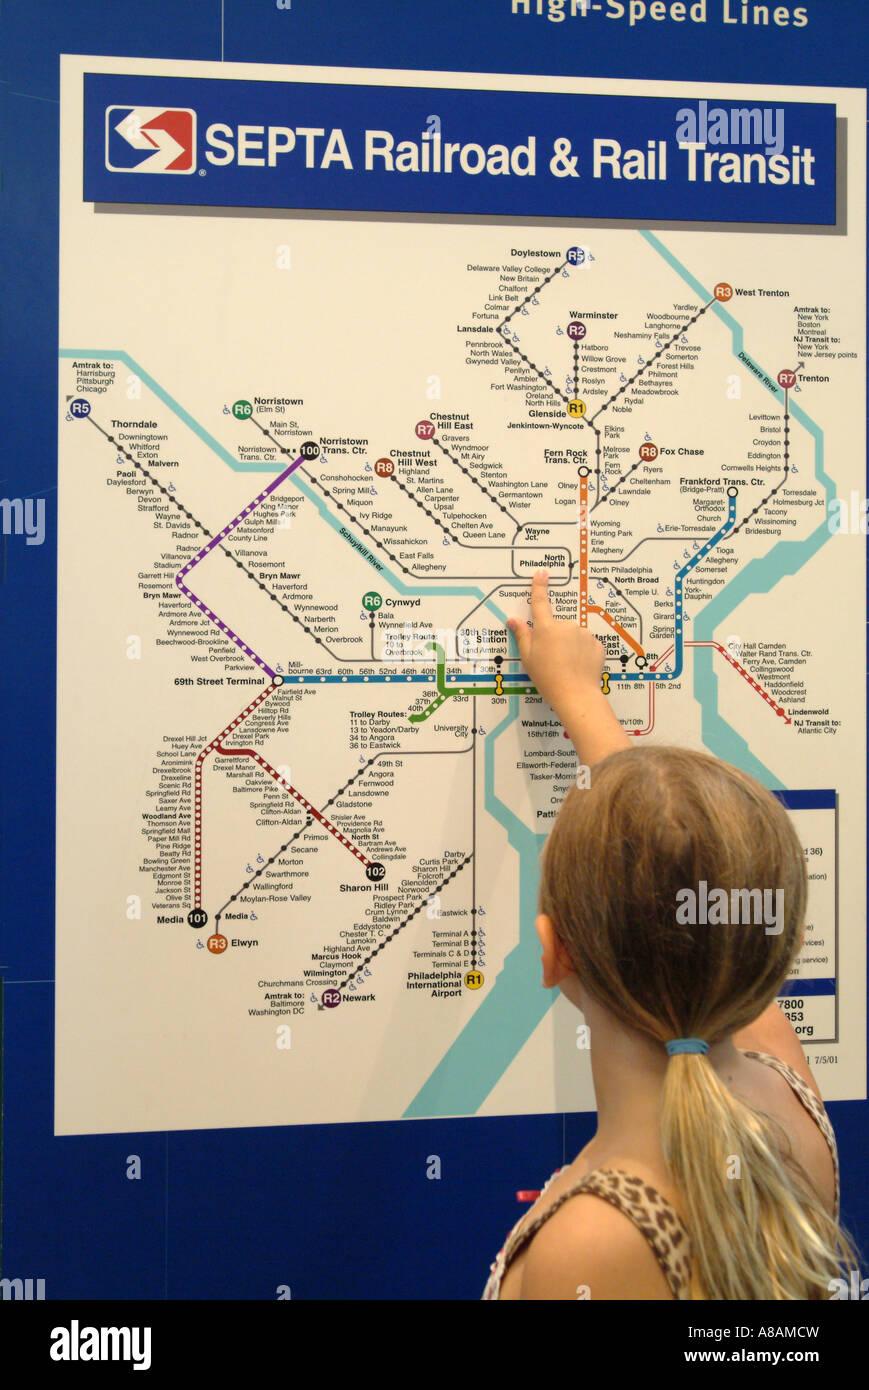 Septa Subway Map Philadelphia.Southeastern Pennsylvania Transportation Authority Septa Map Of The